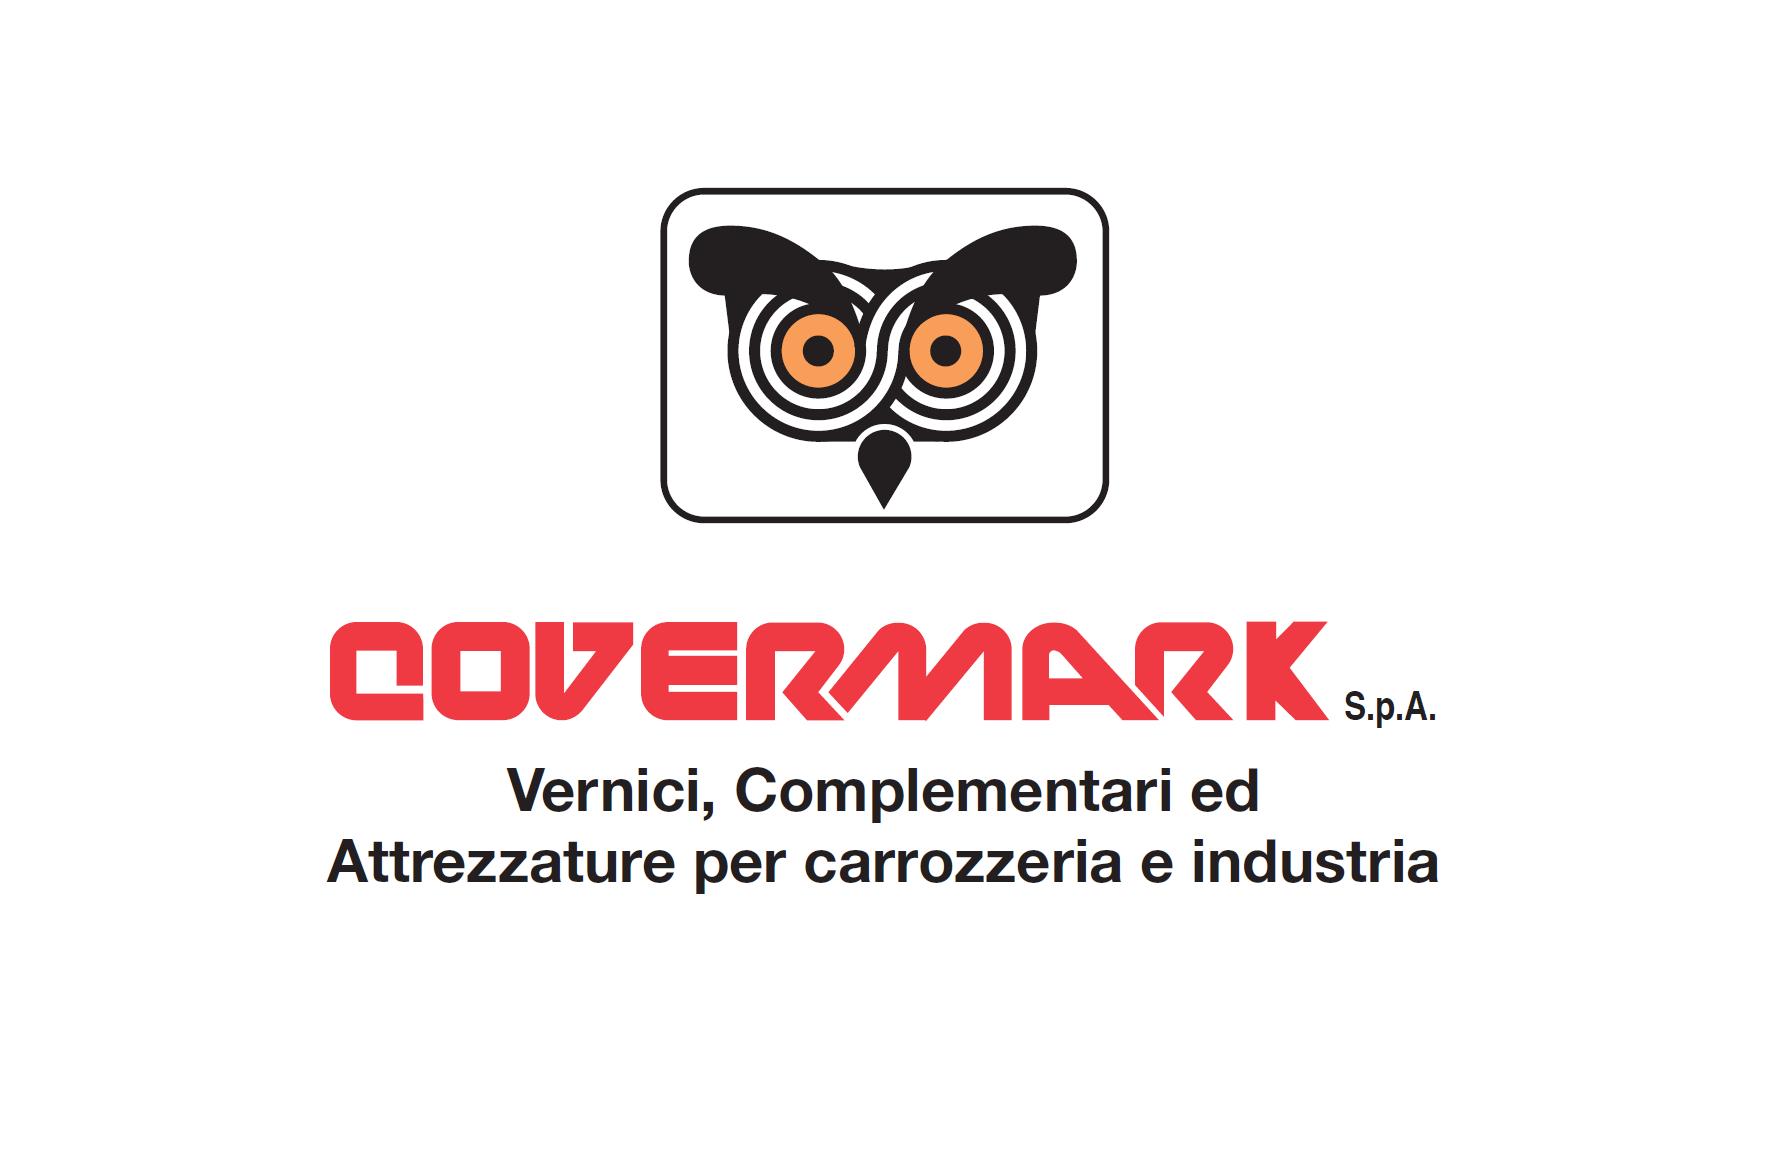 covermark